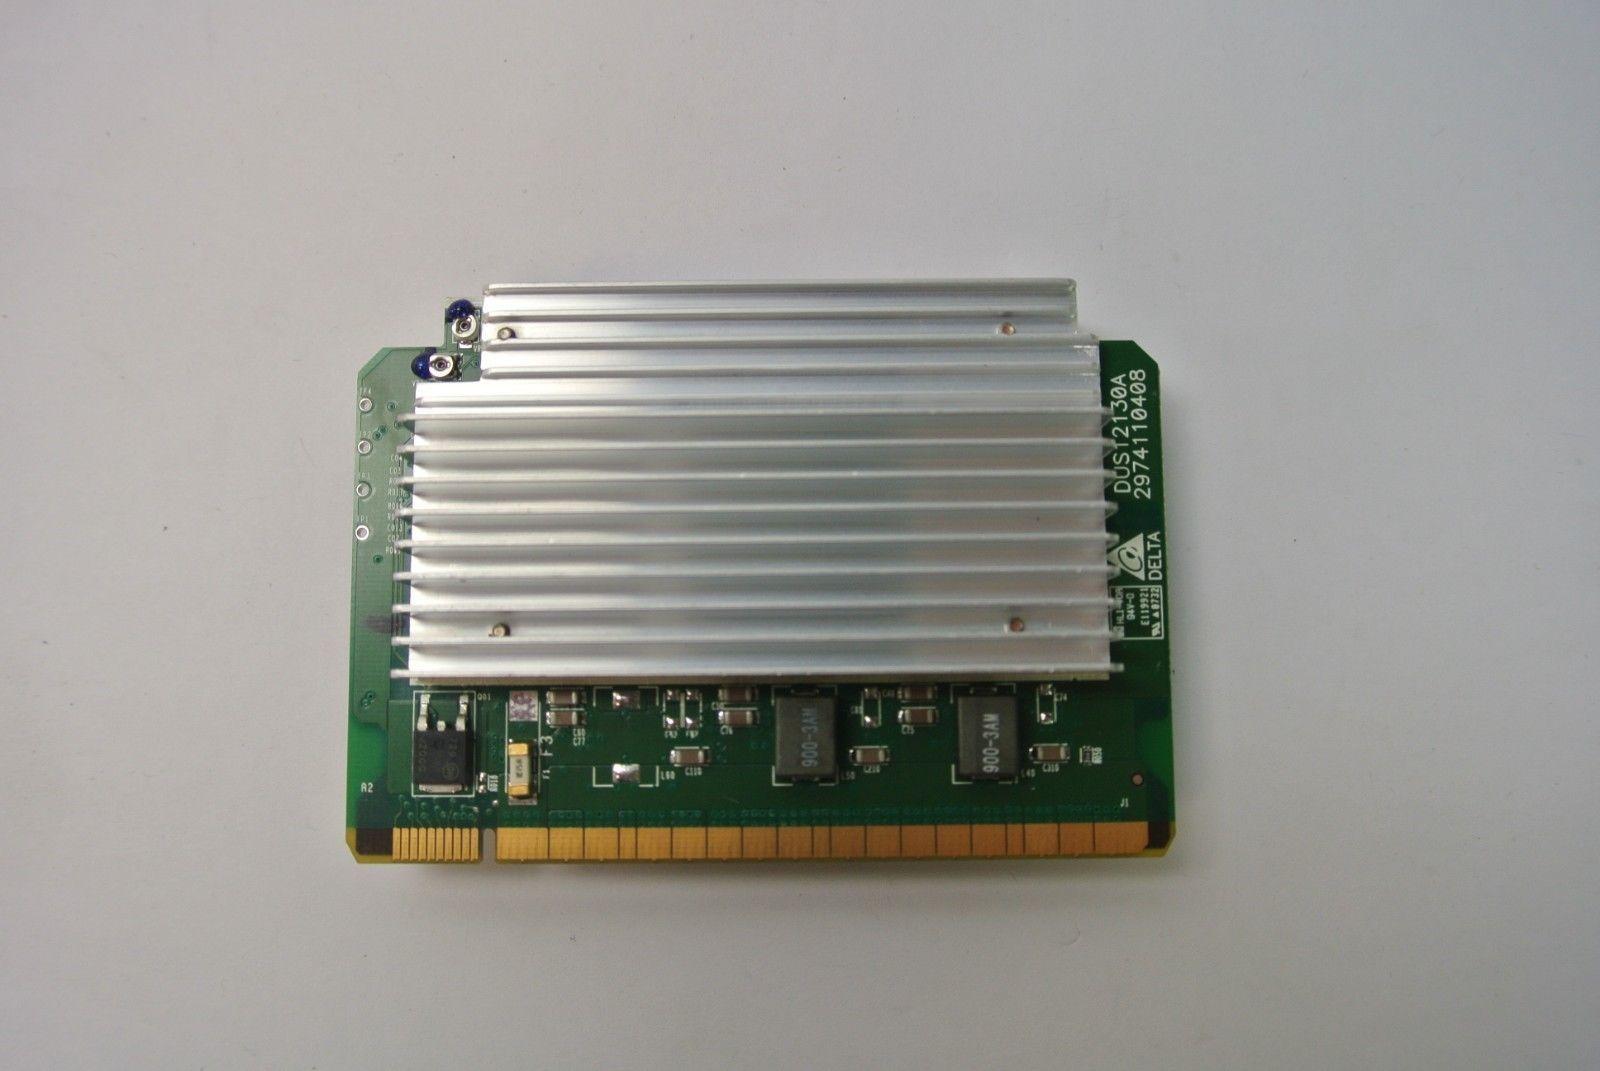 507691-001 Hp Proliant DL385 G6 Pci-E Riser Card